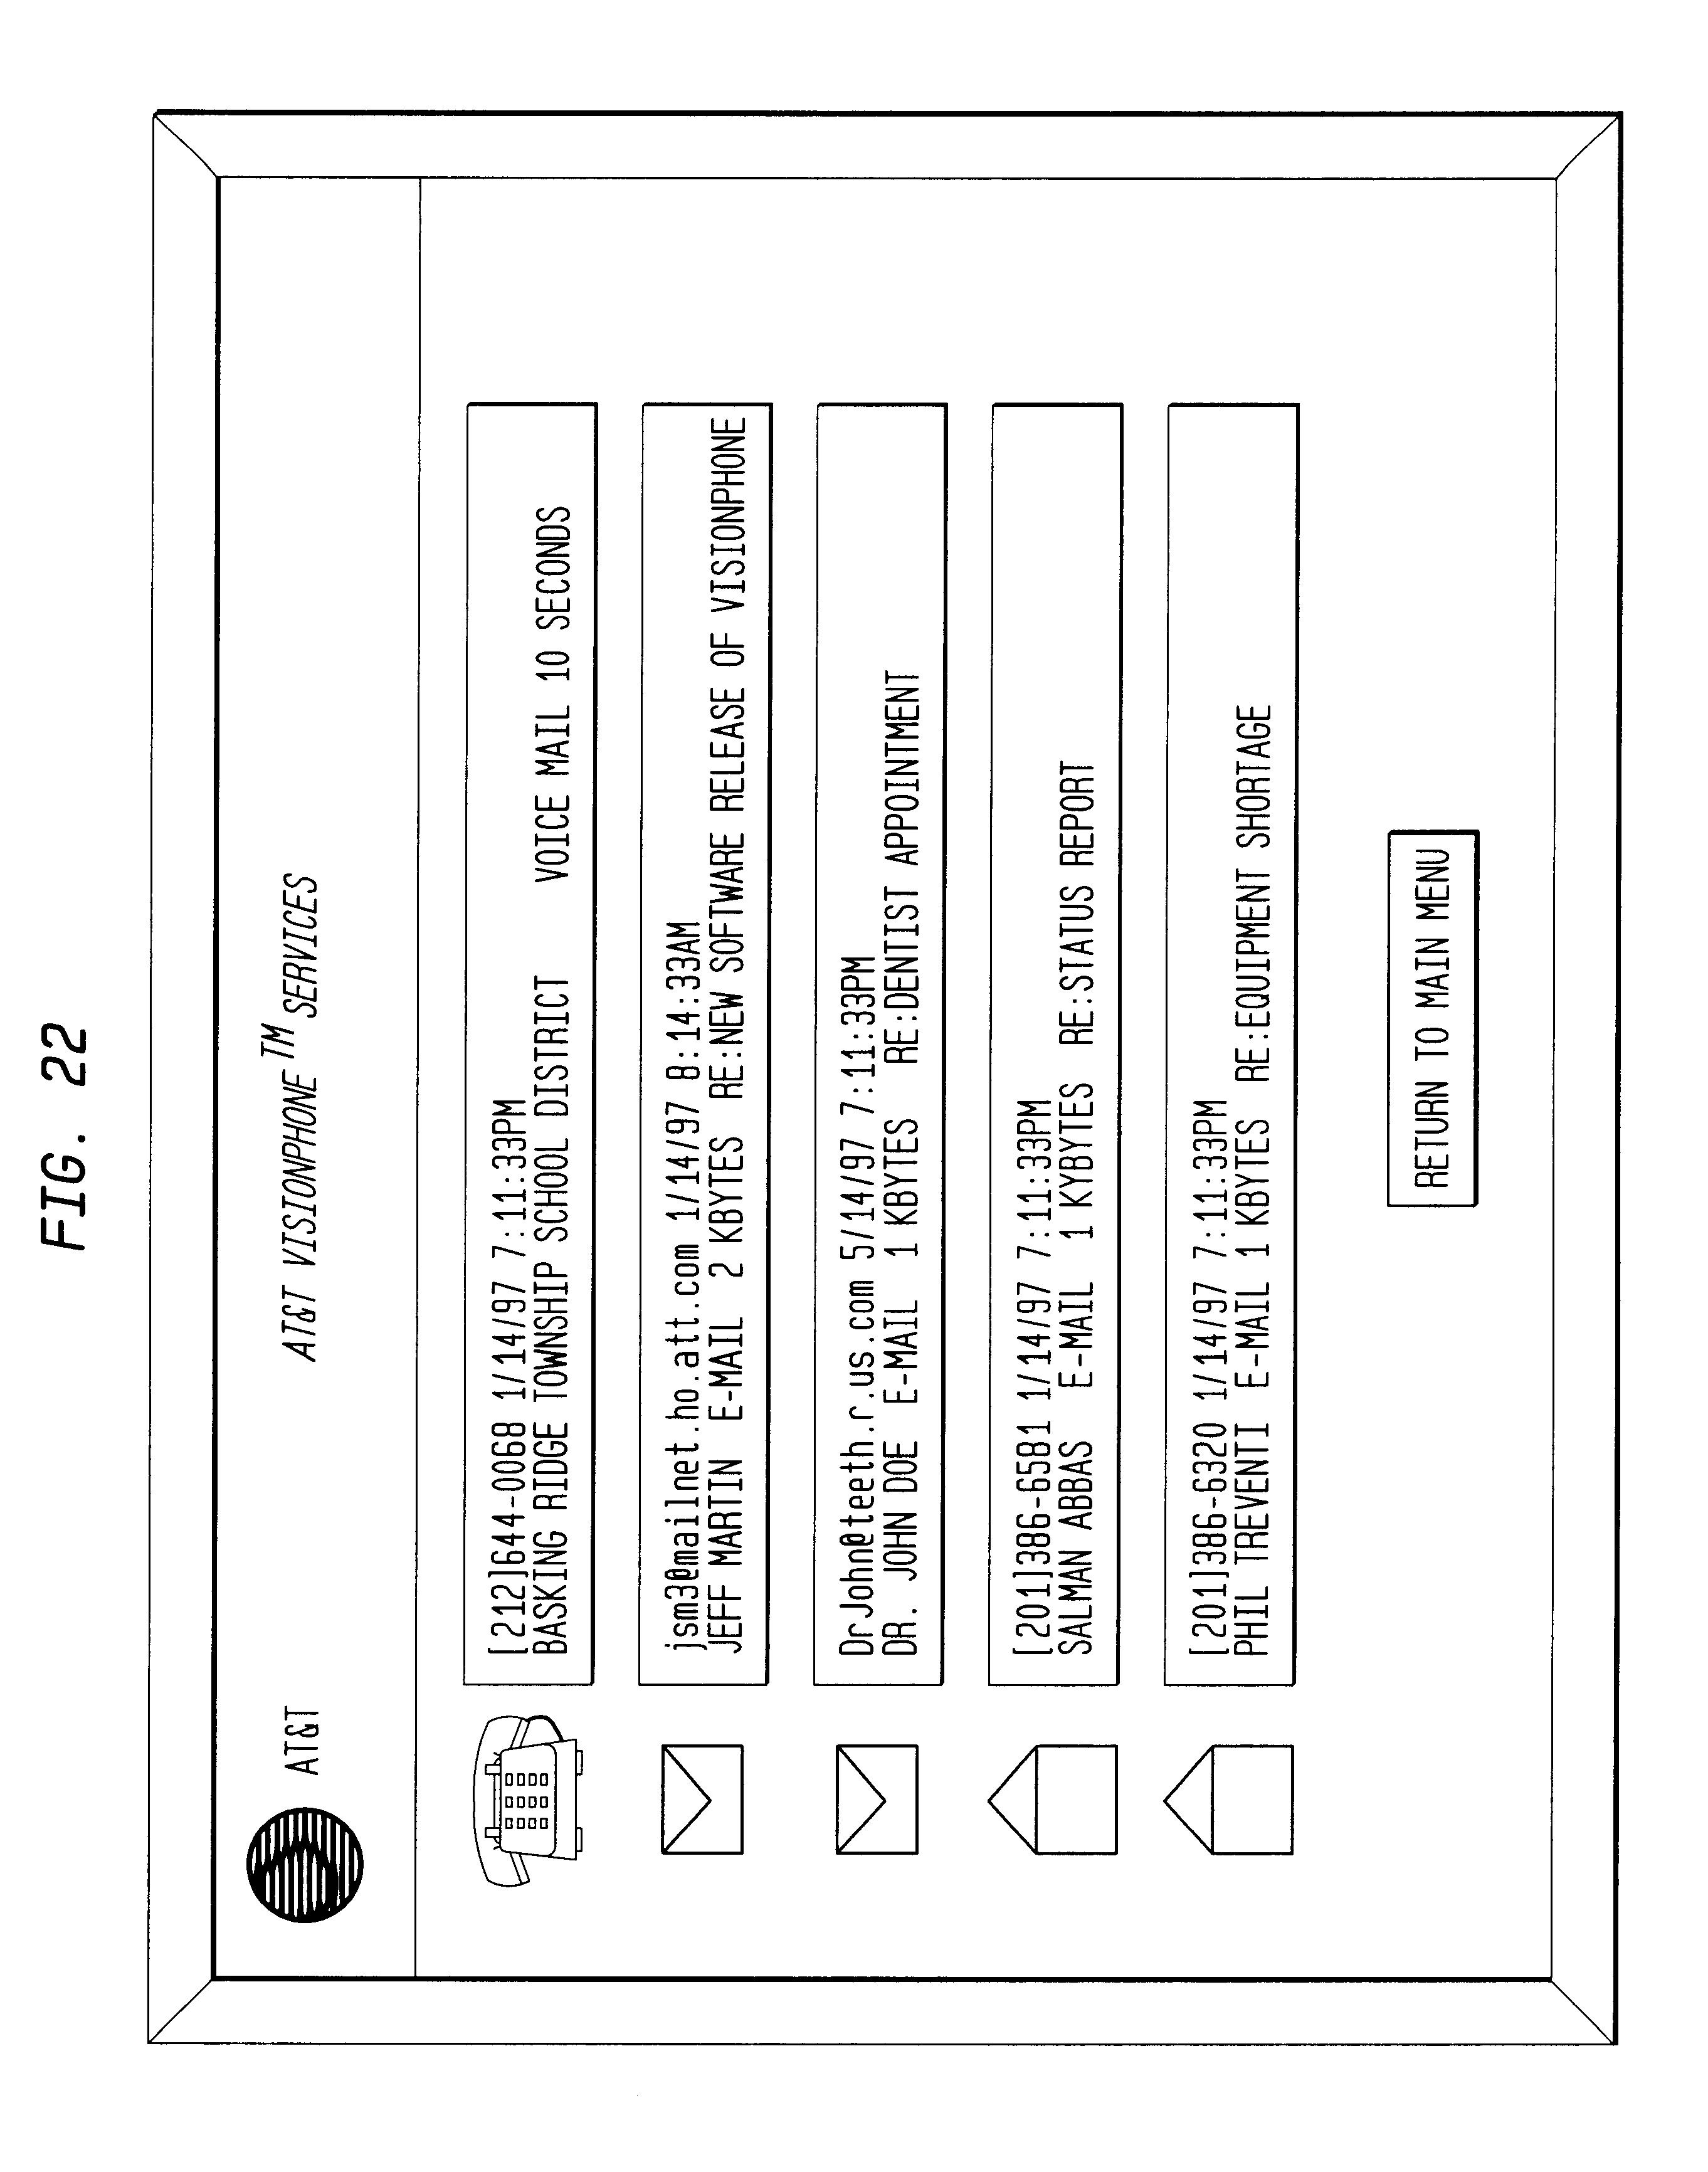 Patent US 6,396,531 B1